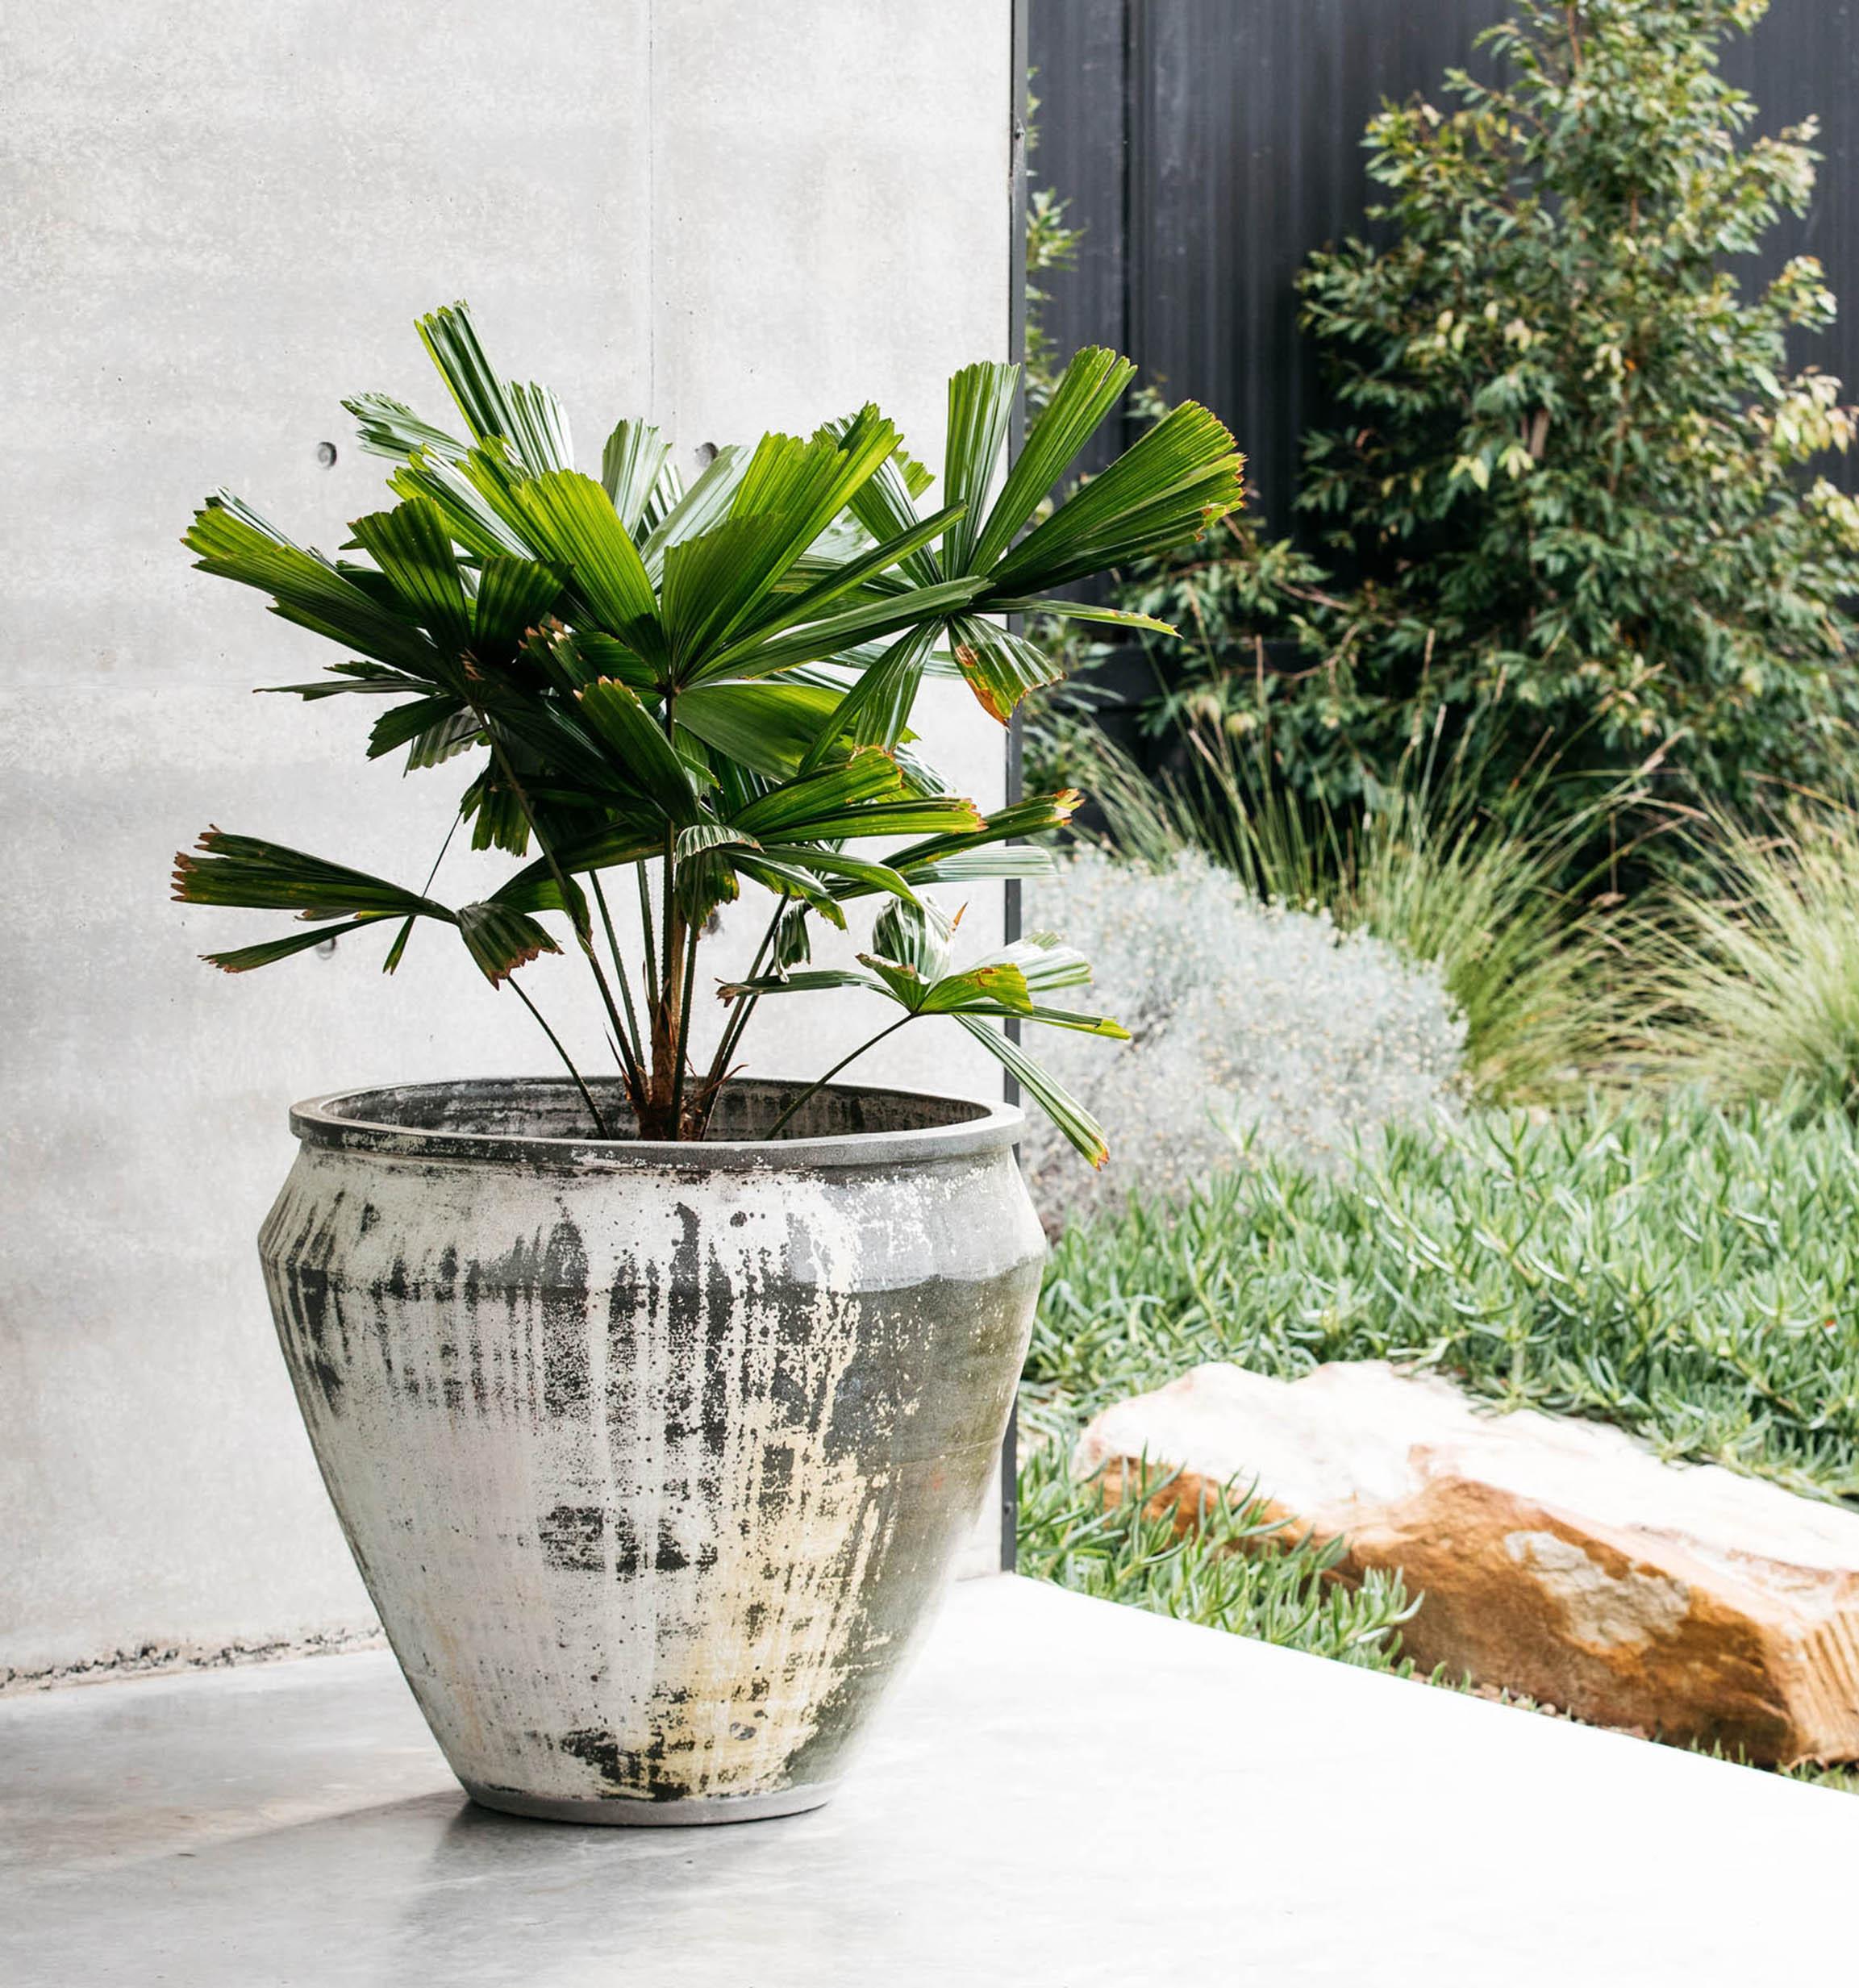 Decor Landare menu-image landare-outdoor-pots